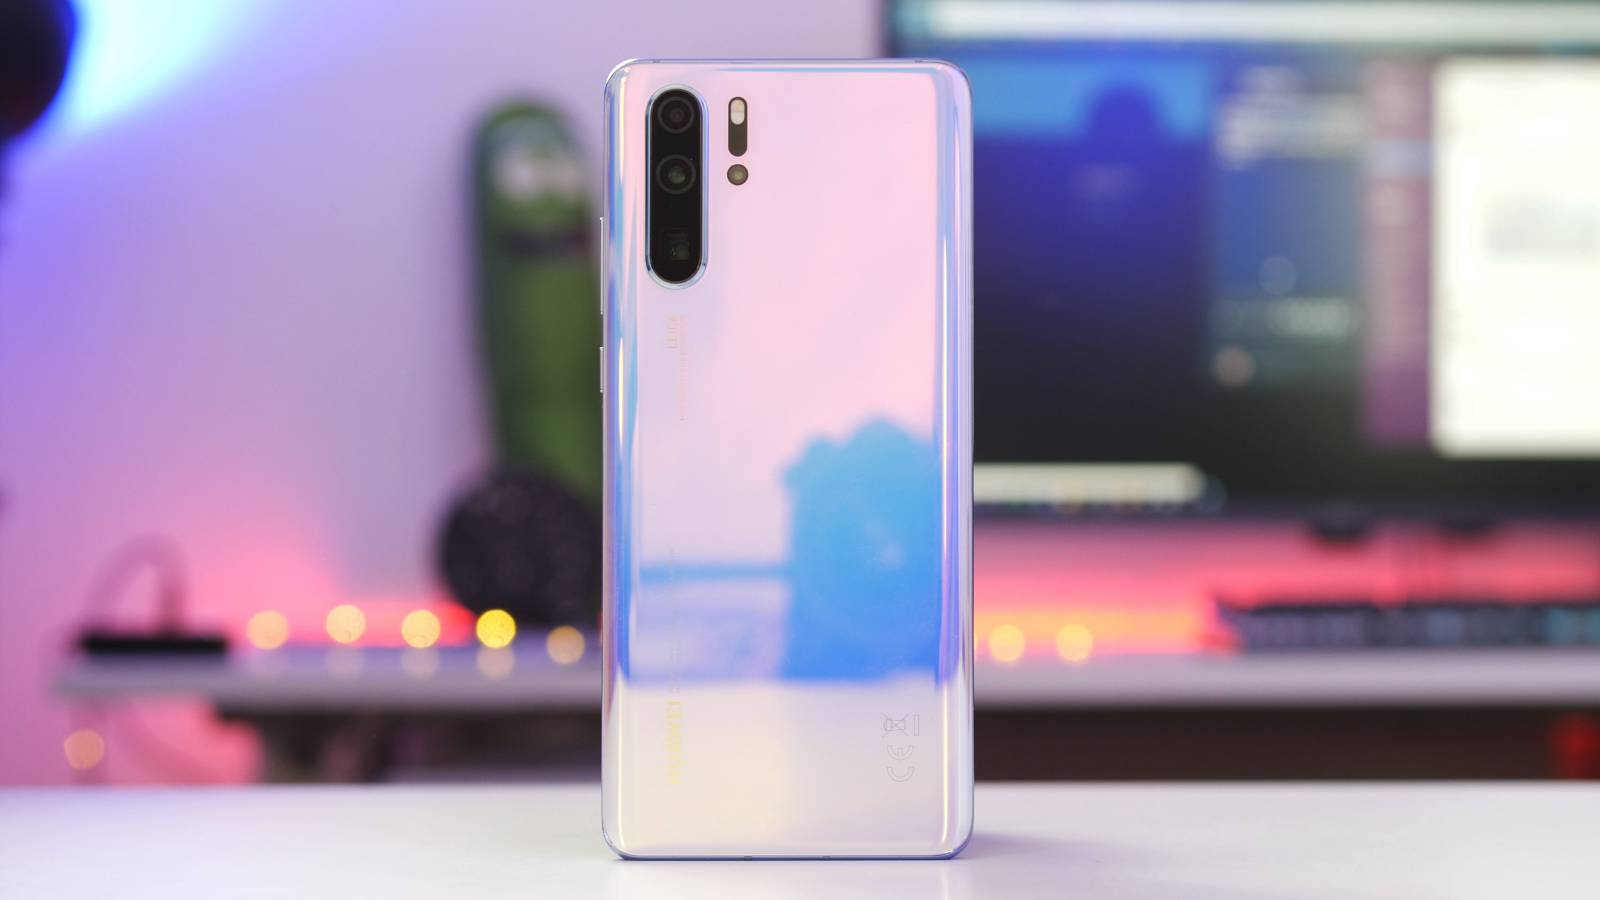 Huawei P30 PRO secret camera